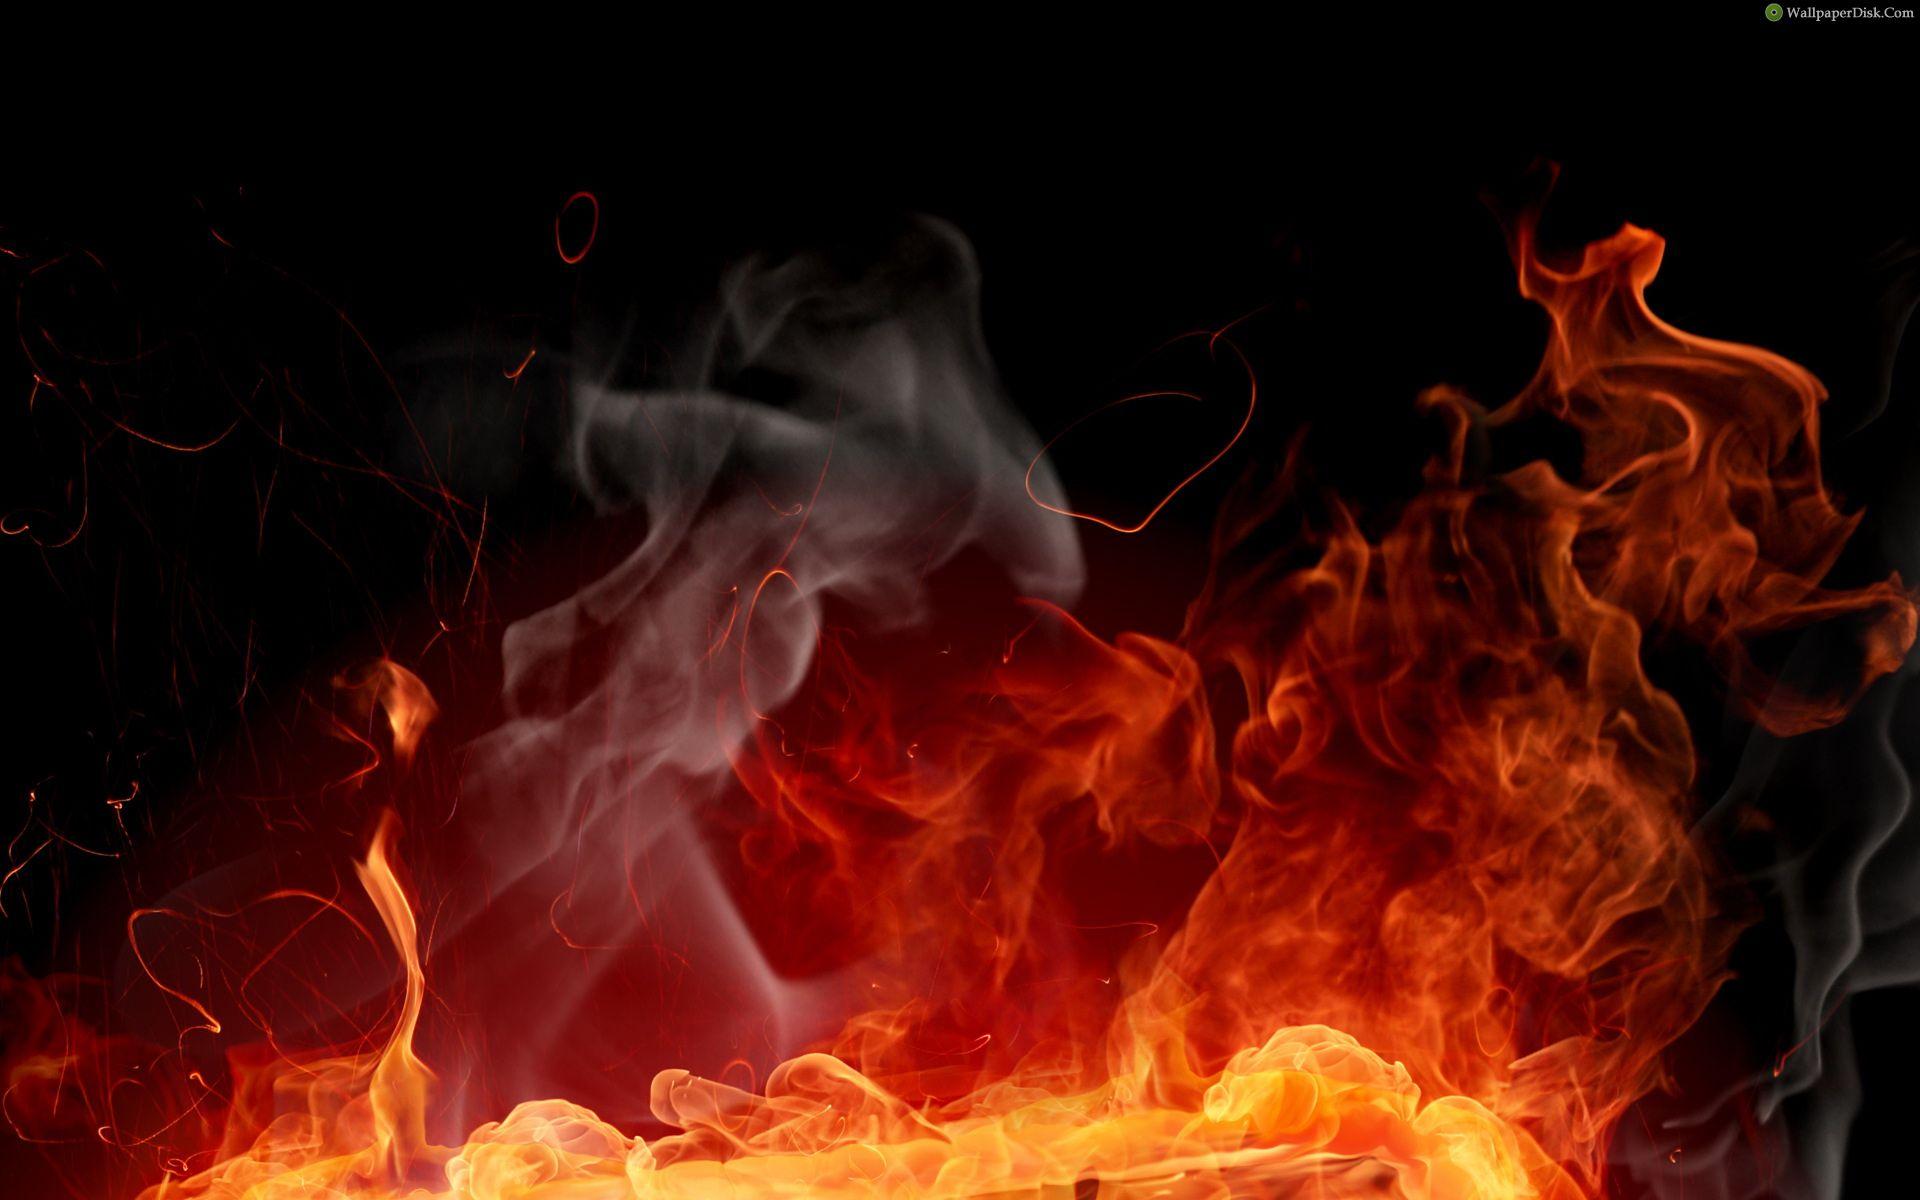 fire background wallpaper hd